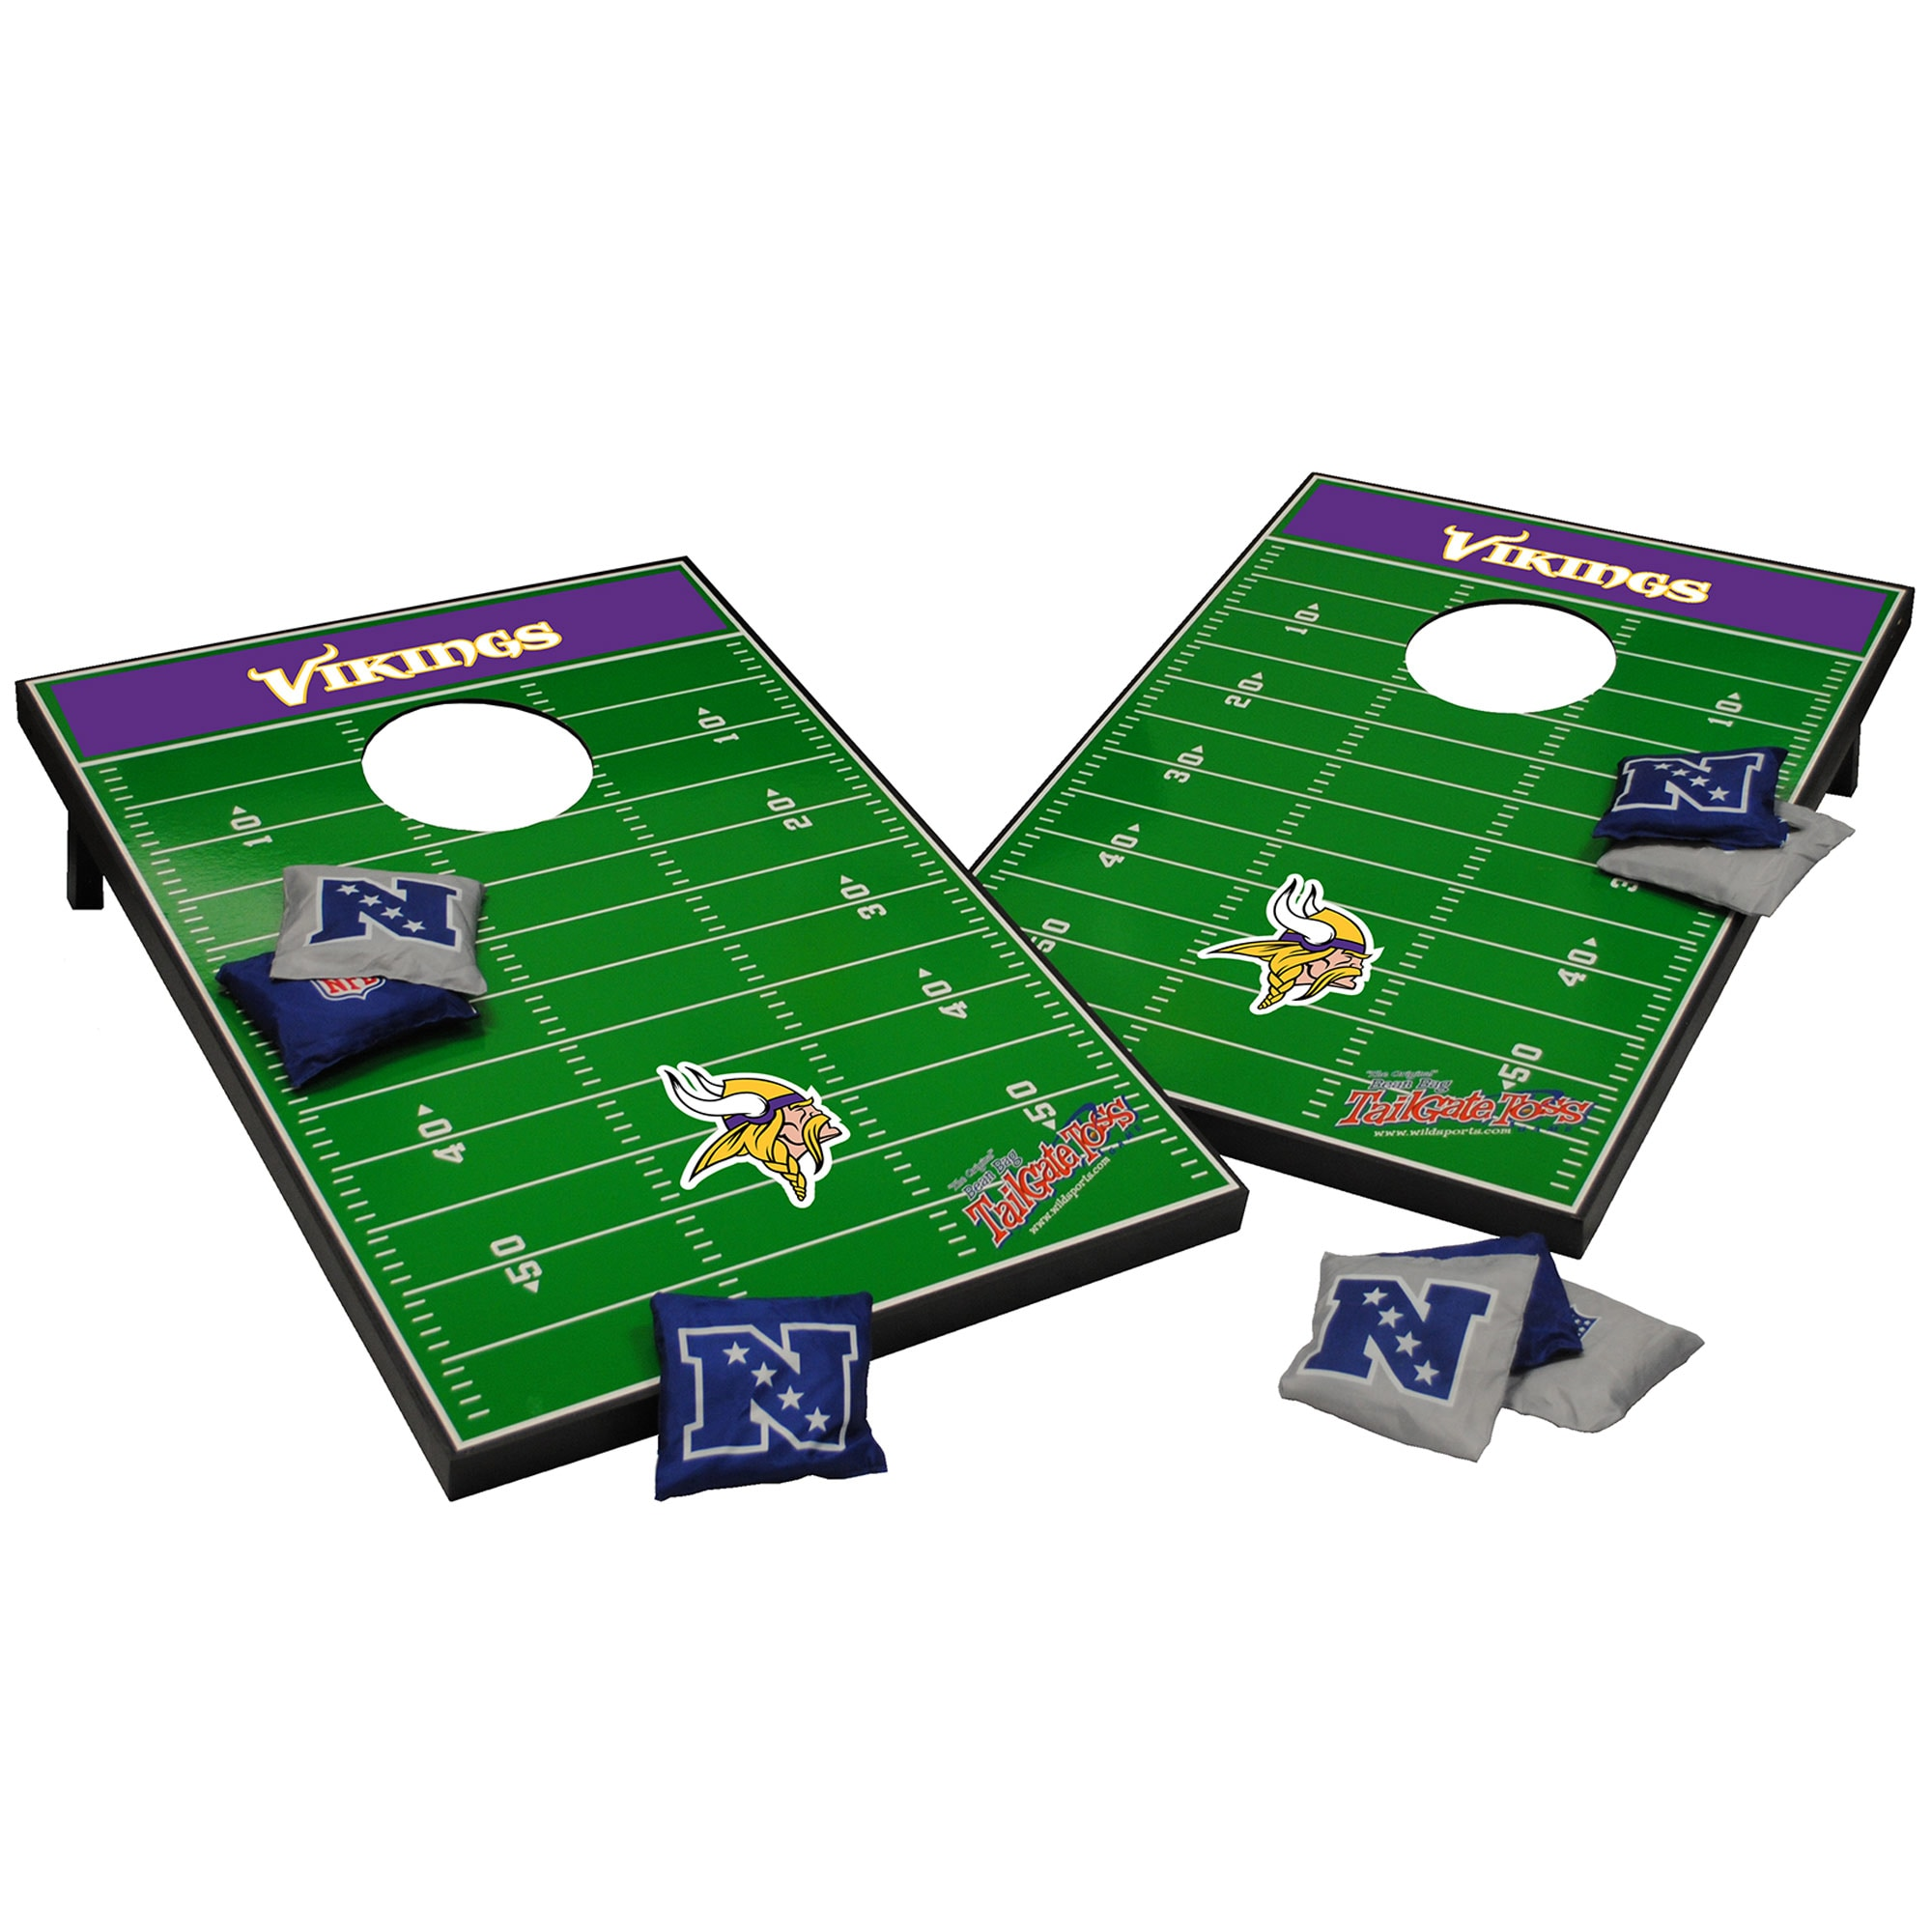 Minnesota Vikings 2' x 3' Cornhole Board Tailgate Toss Set